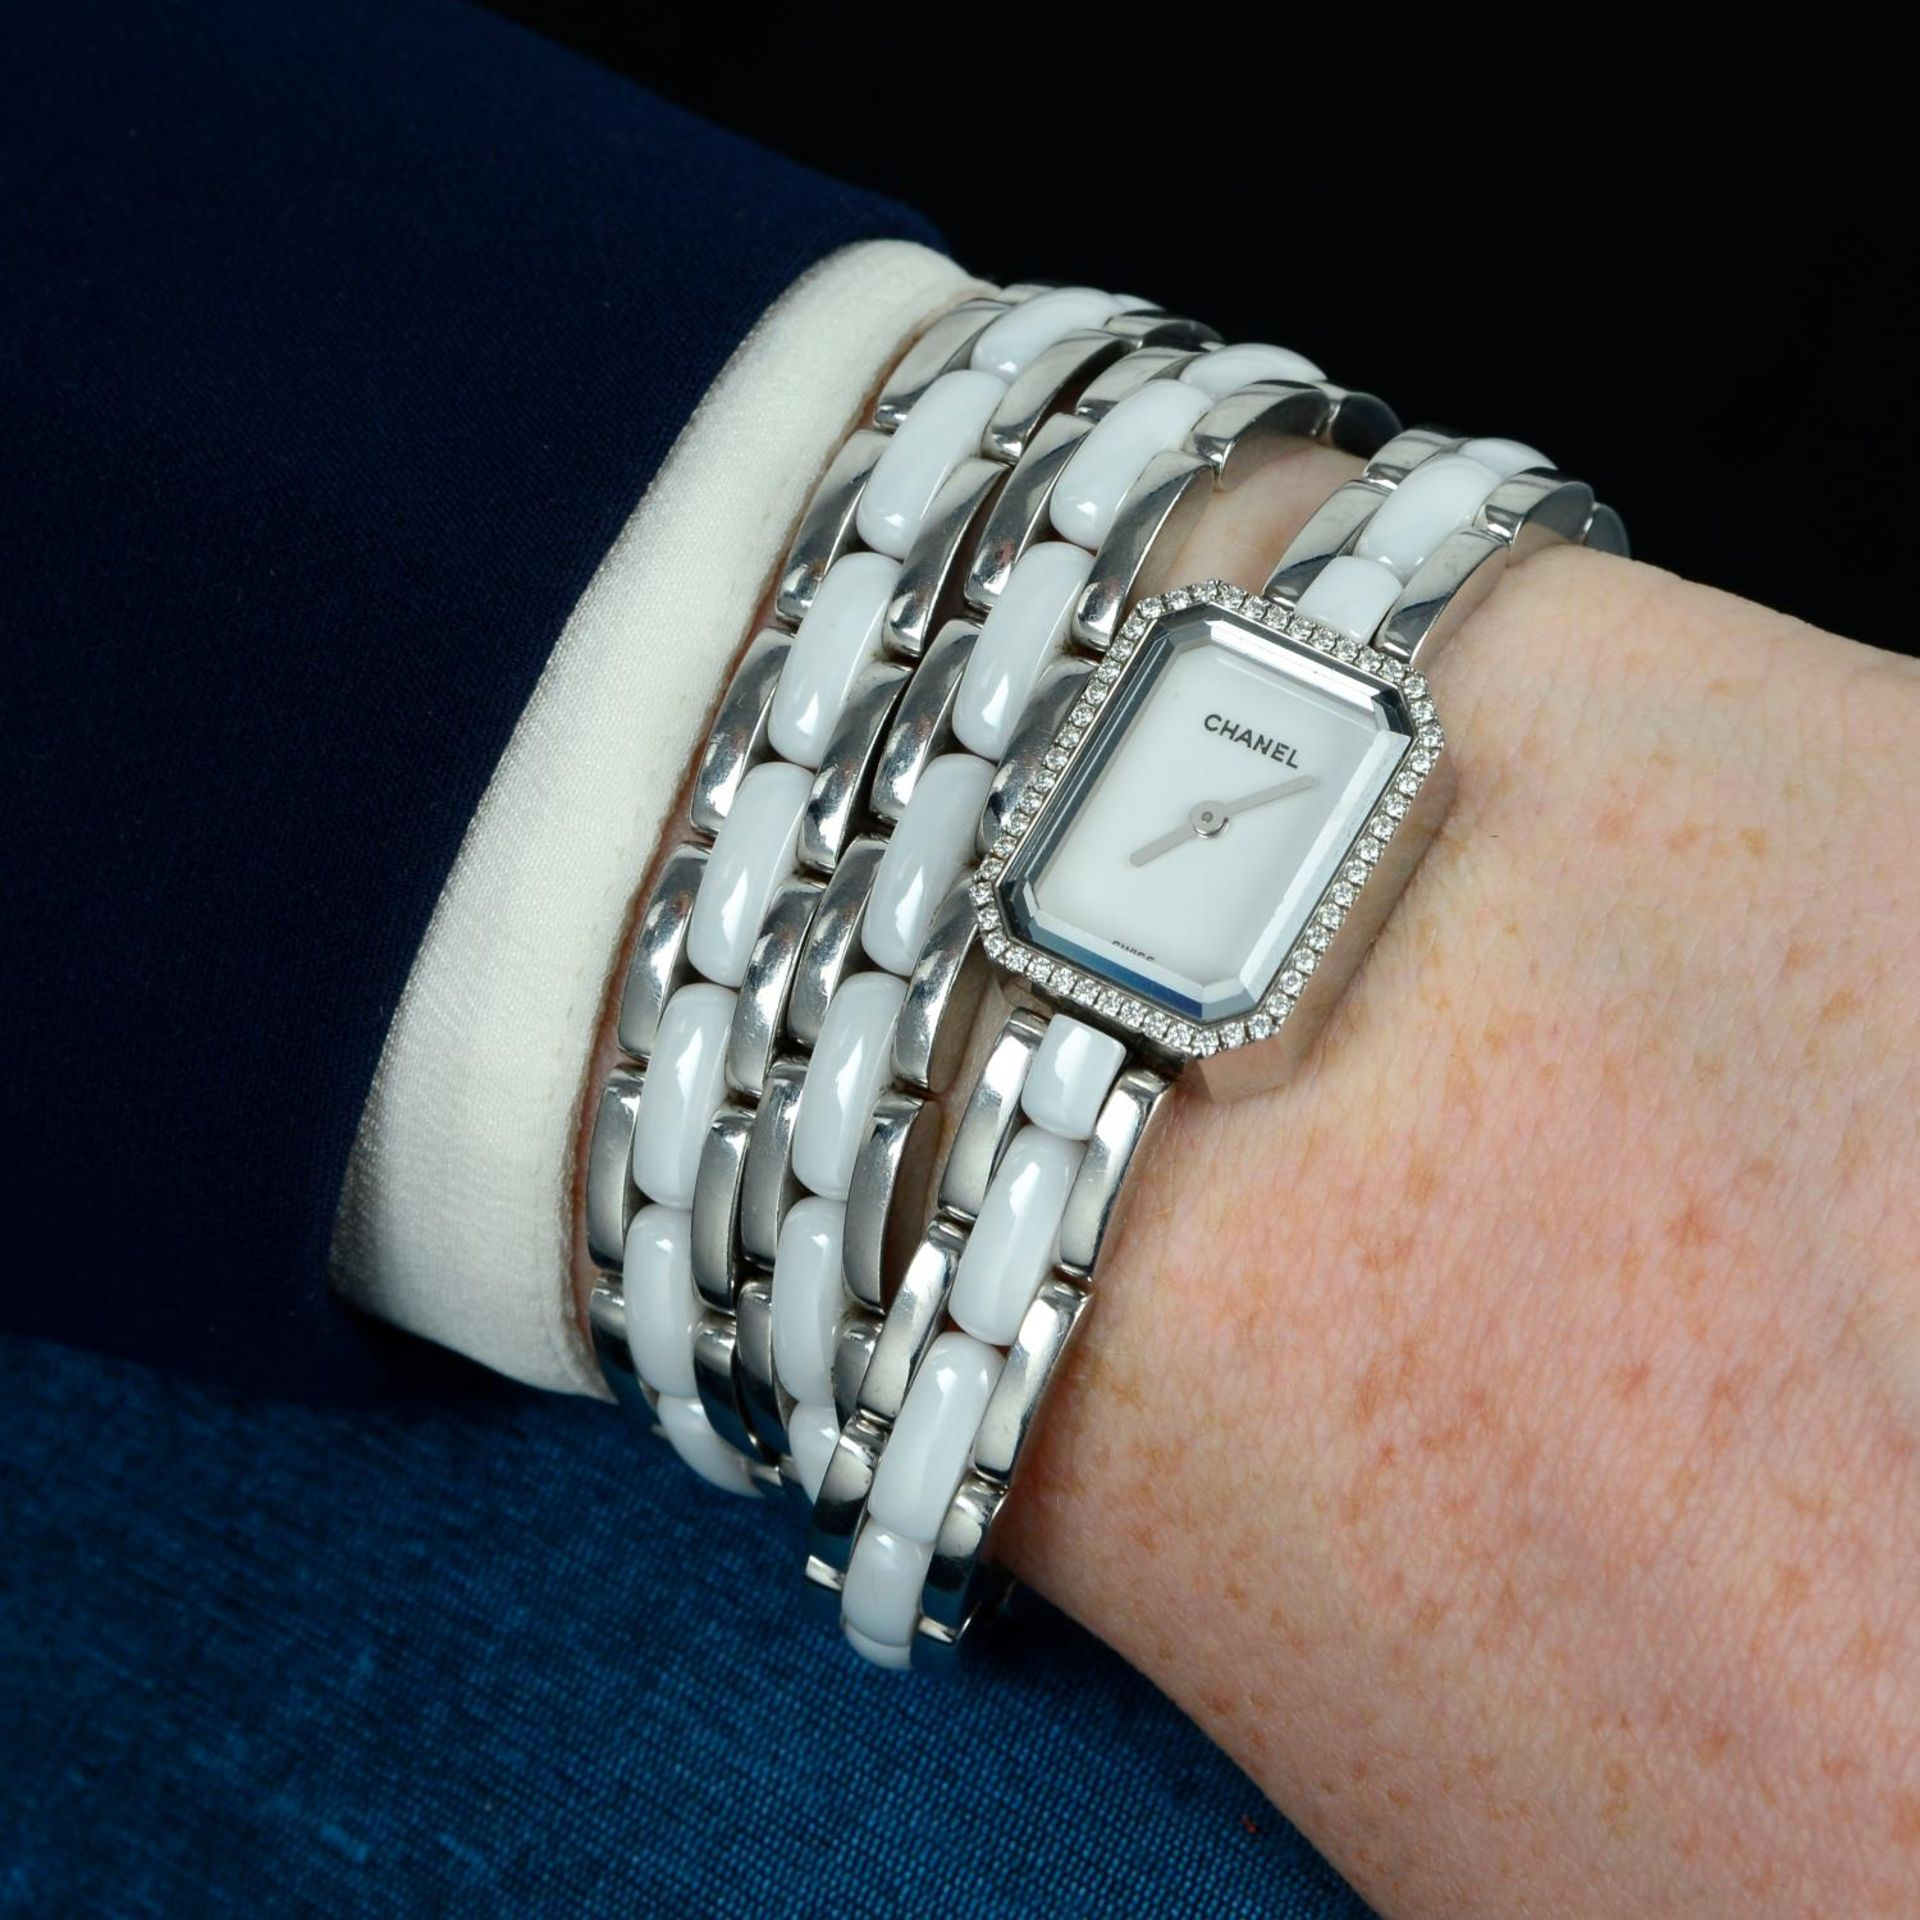 CHANEL - a Premiere bracelet watch. - Bild 3 aus 5